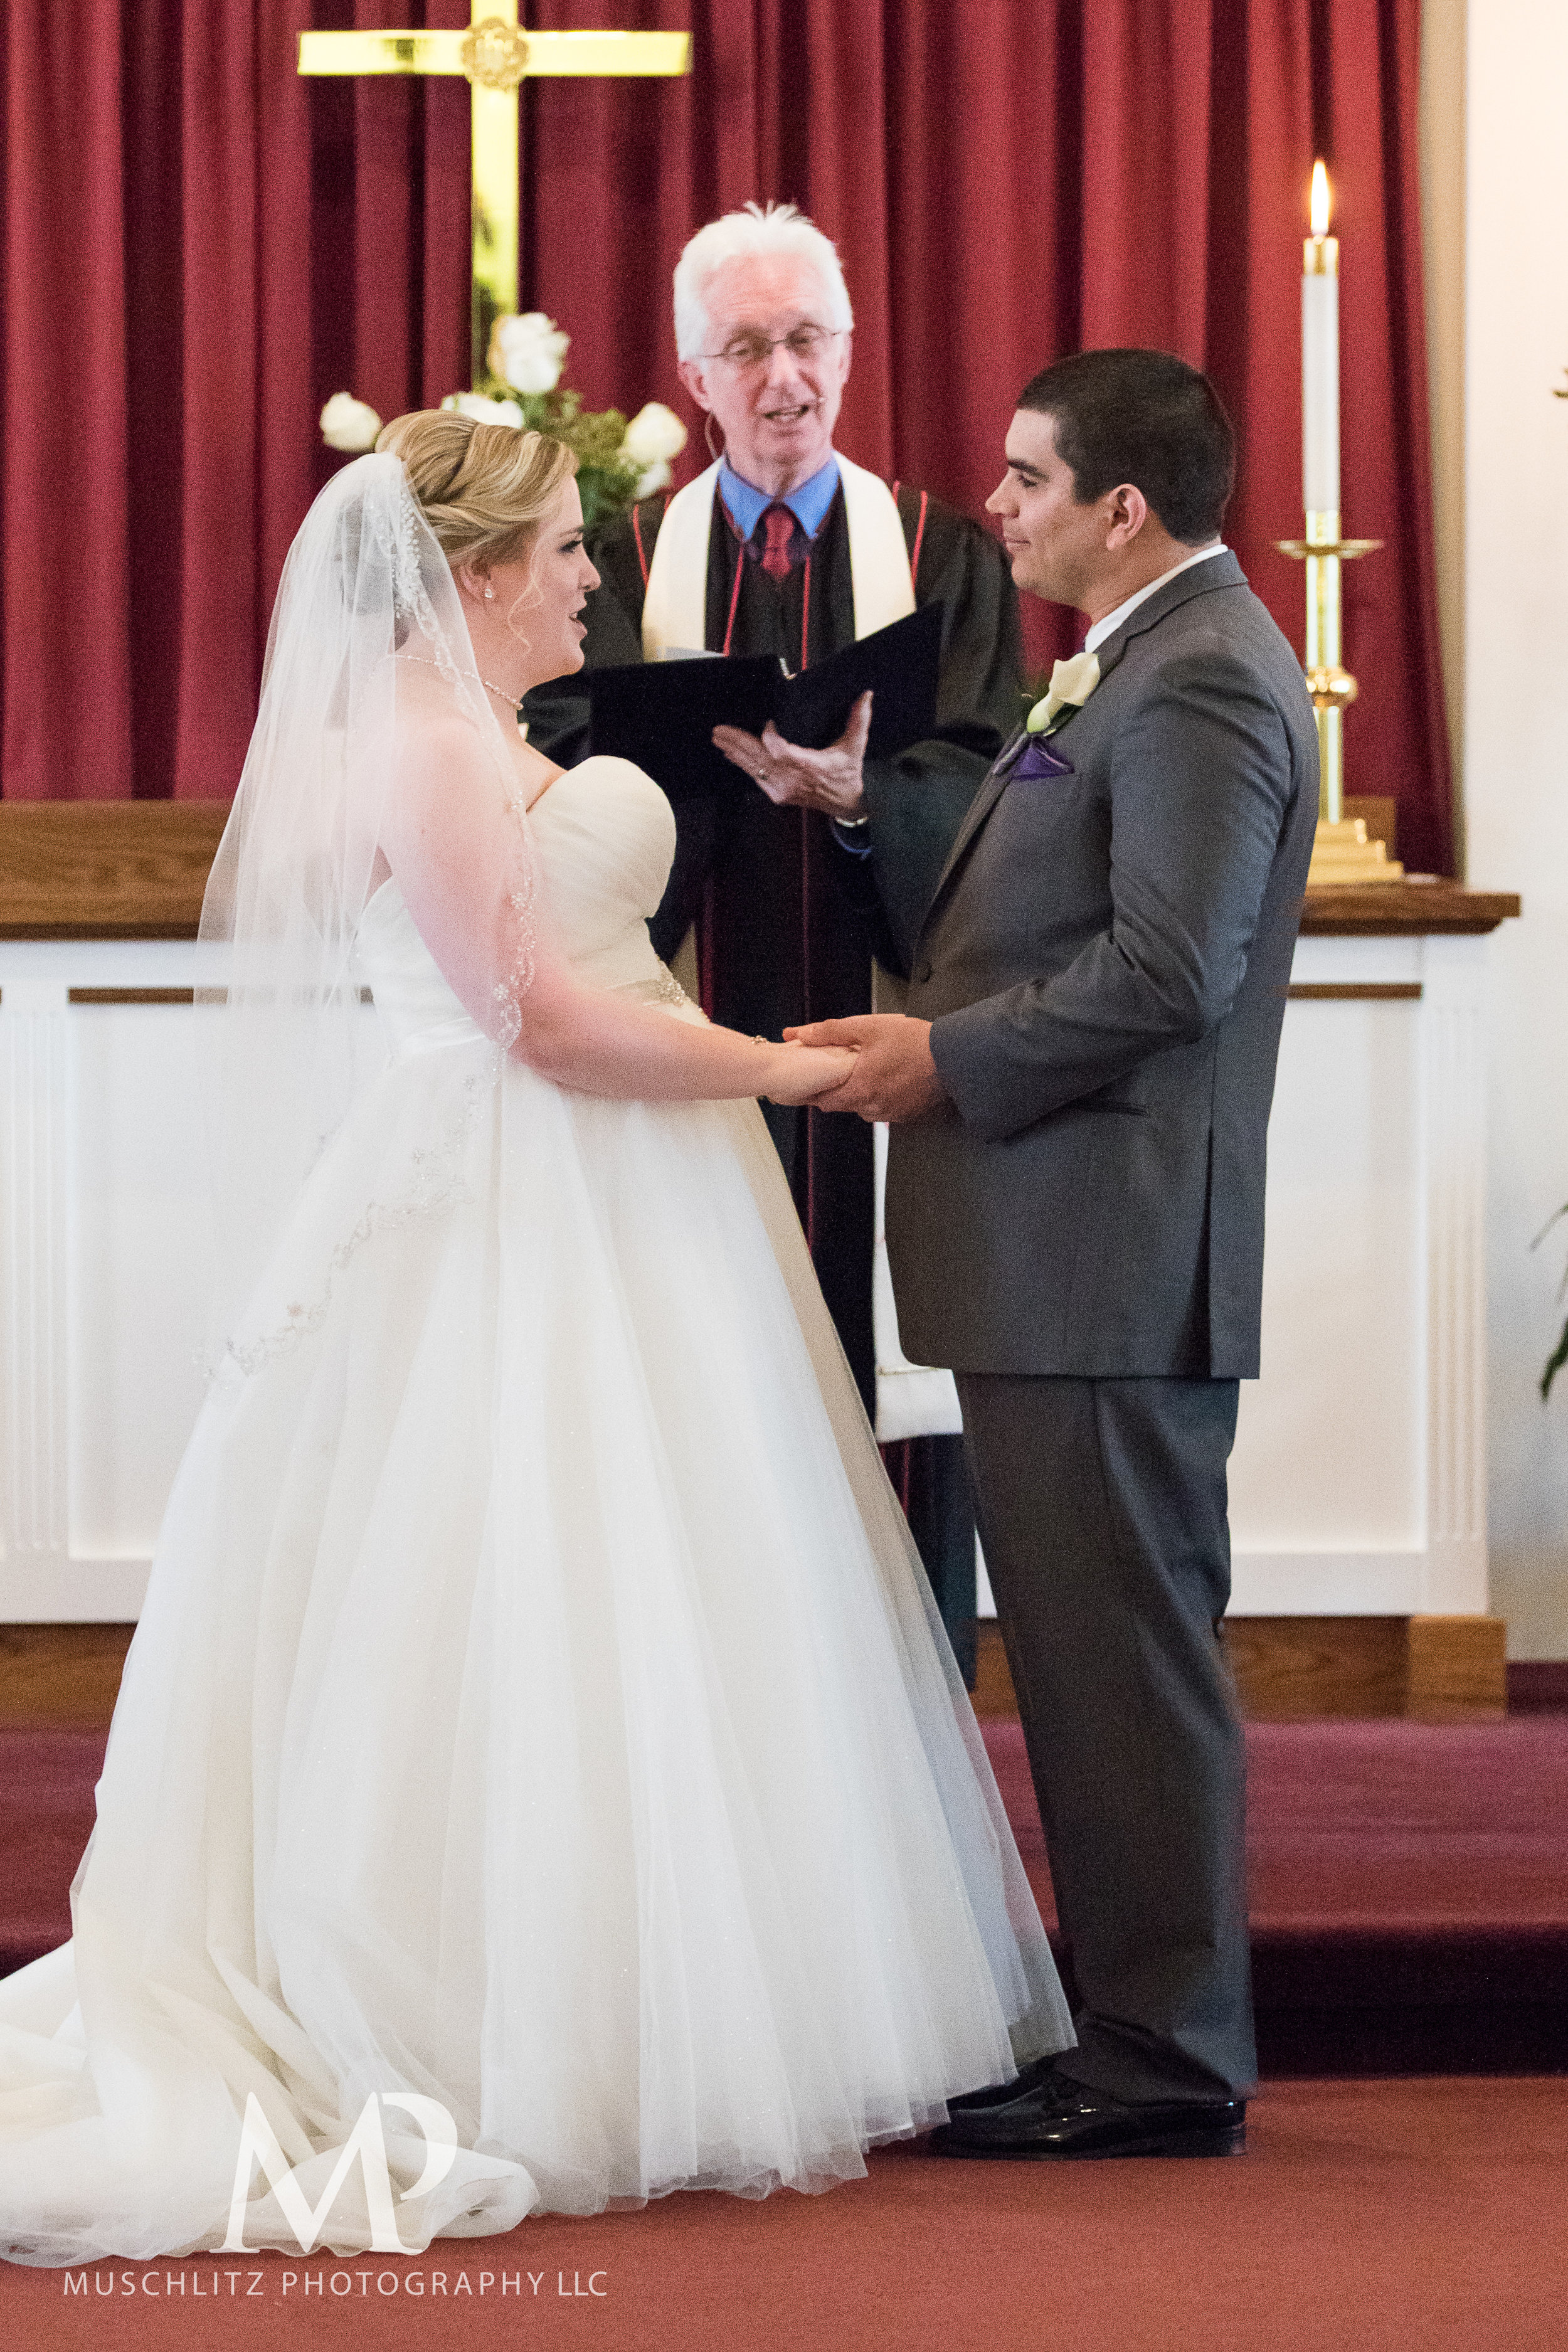 dublin-community-church-wedding-columbus-ohio-muschlitz-photography-046.JPG